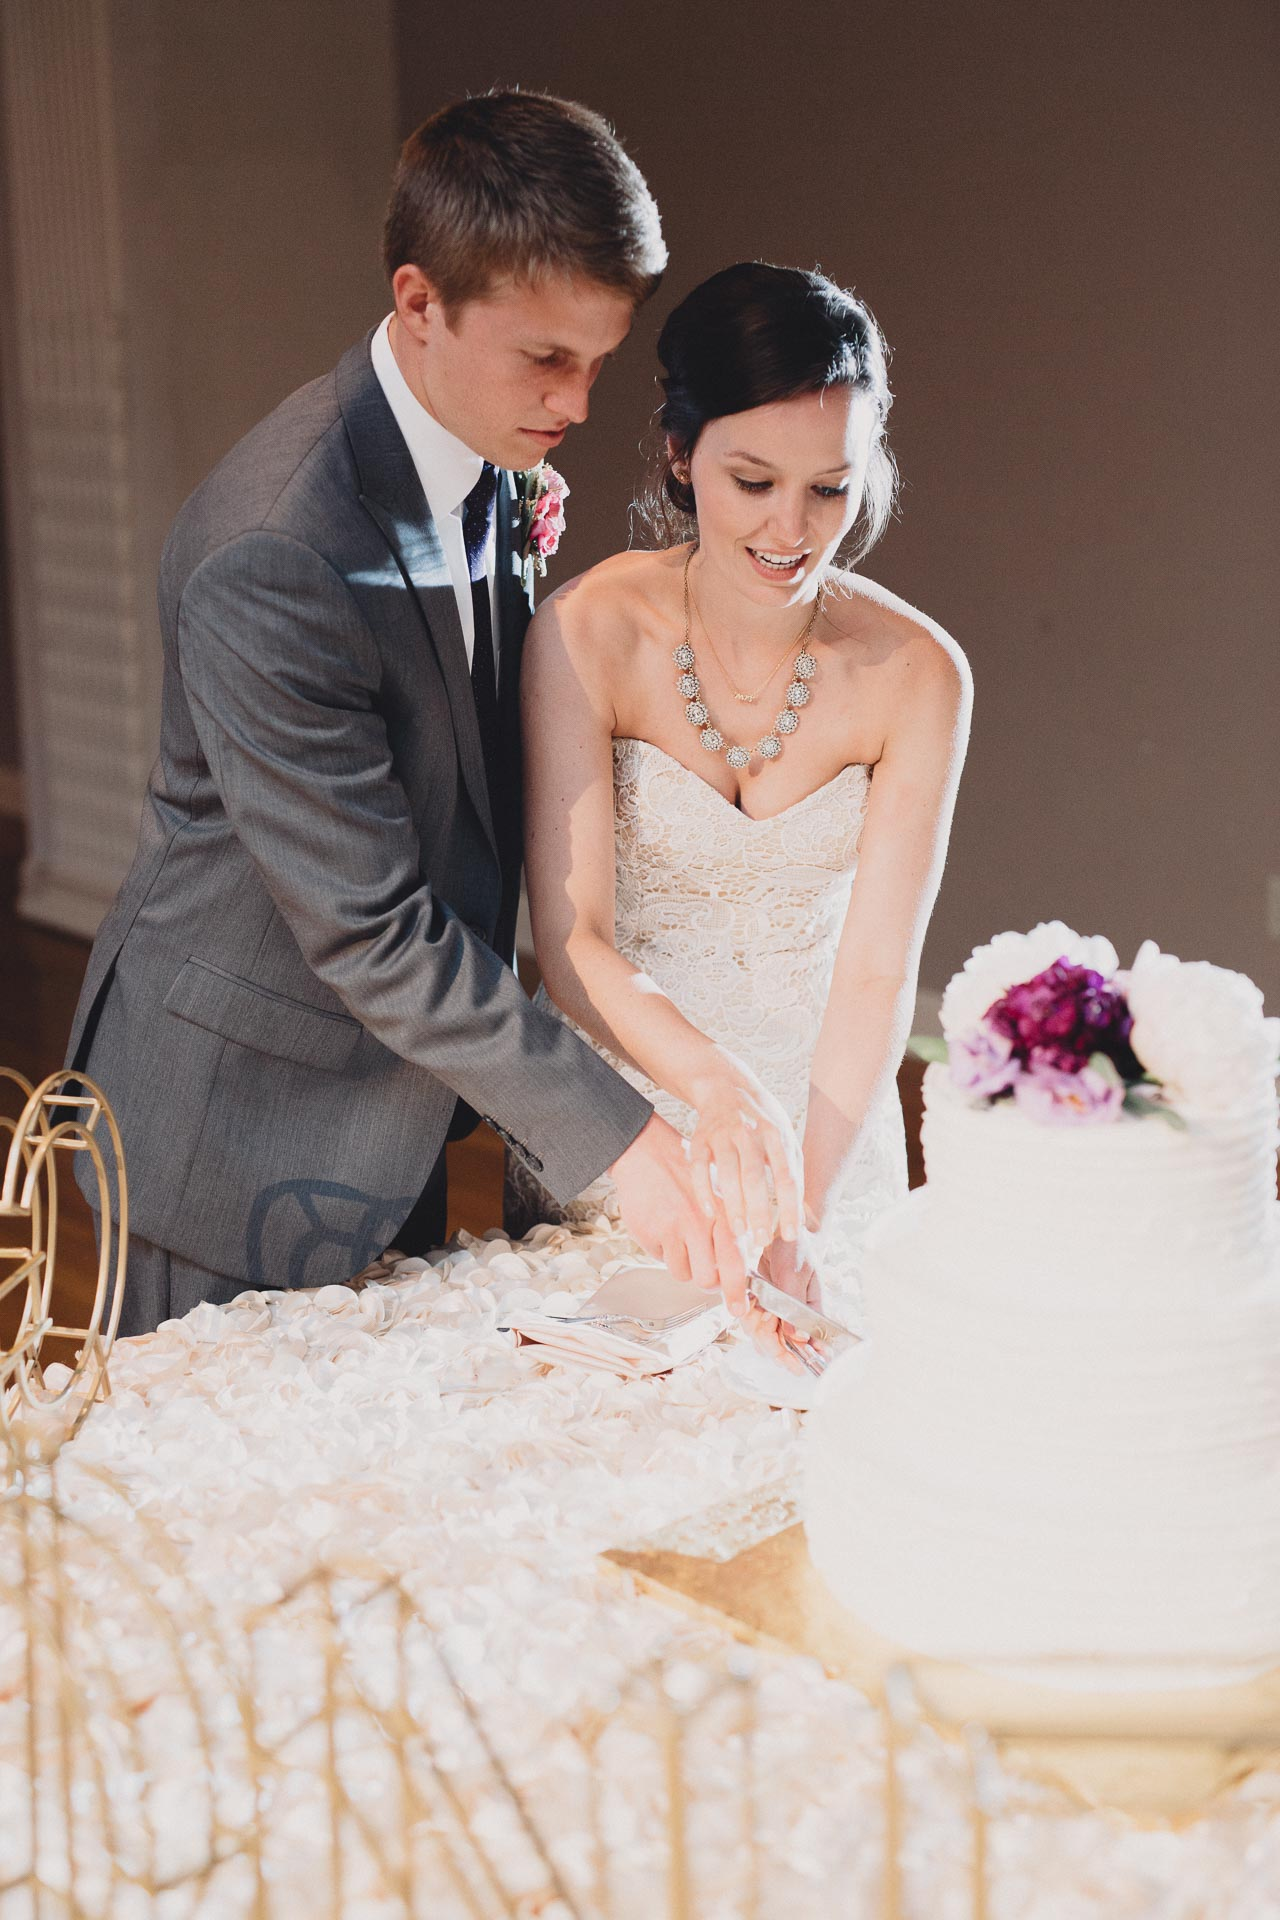 Julia-Michael-Cincinnati-Music-Hall-Wedding-129@2x.jpg